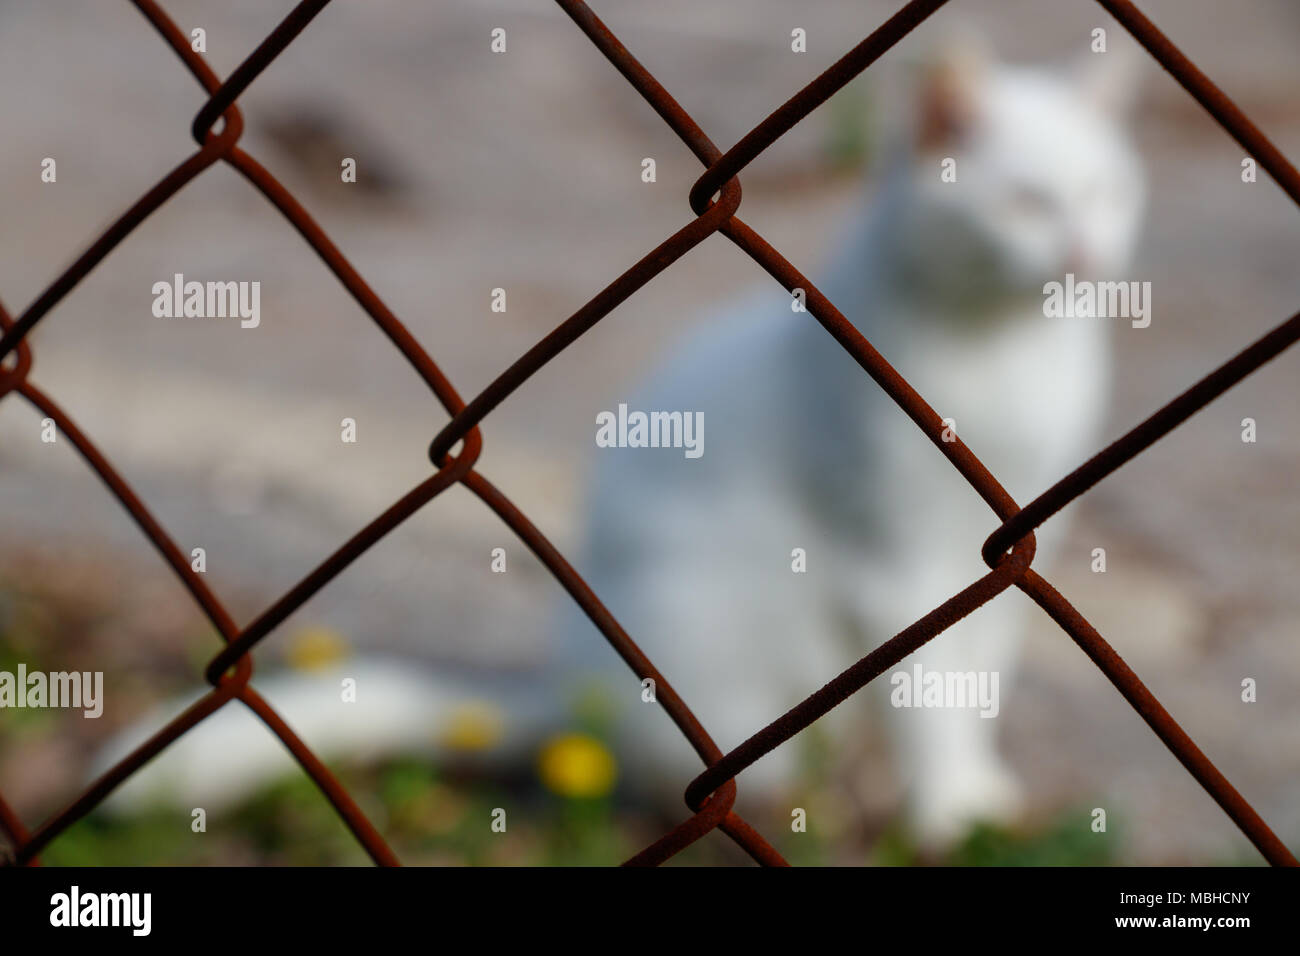 Zaun Draht Hintergrund Weisse Katze Stockfoto Bild 179248103 Alamy